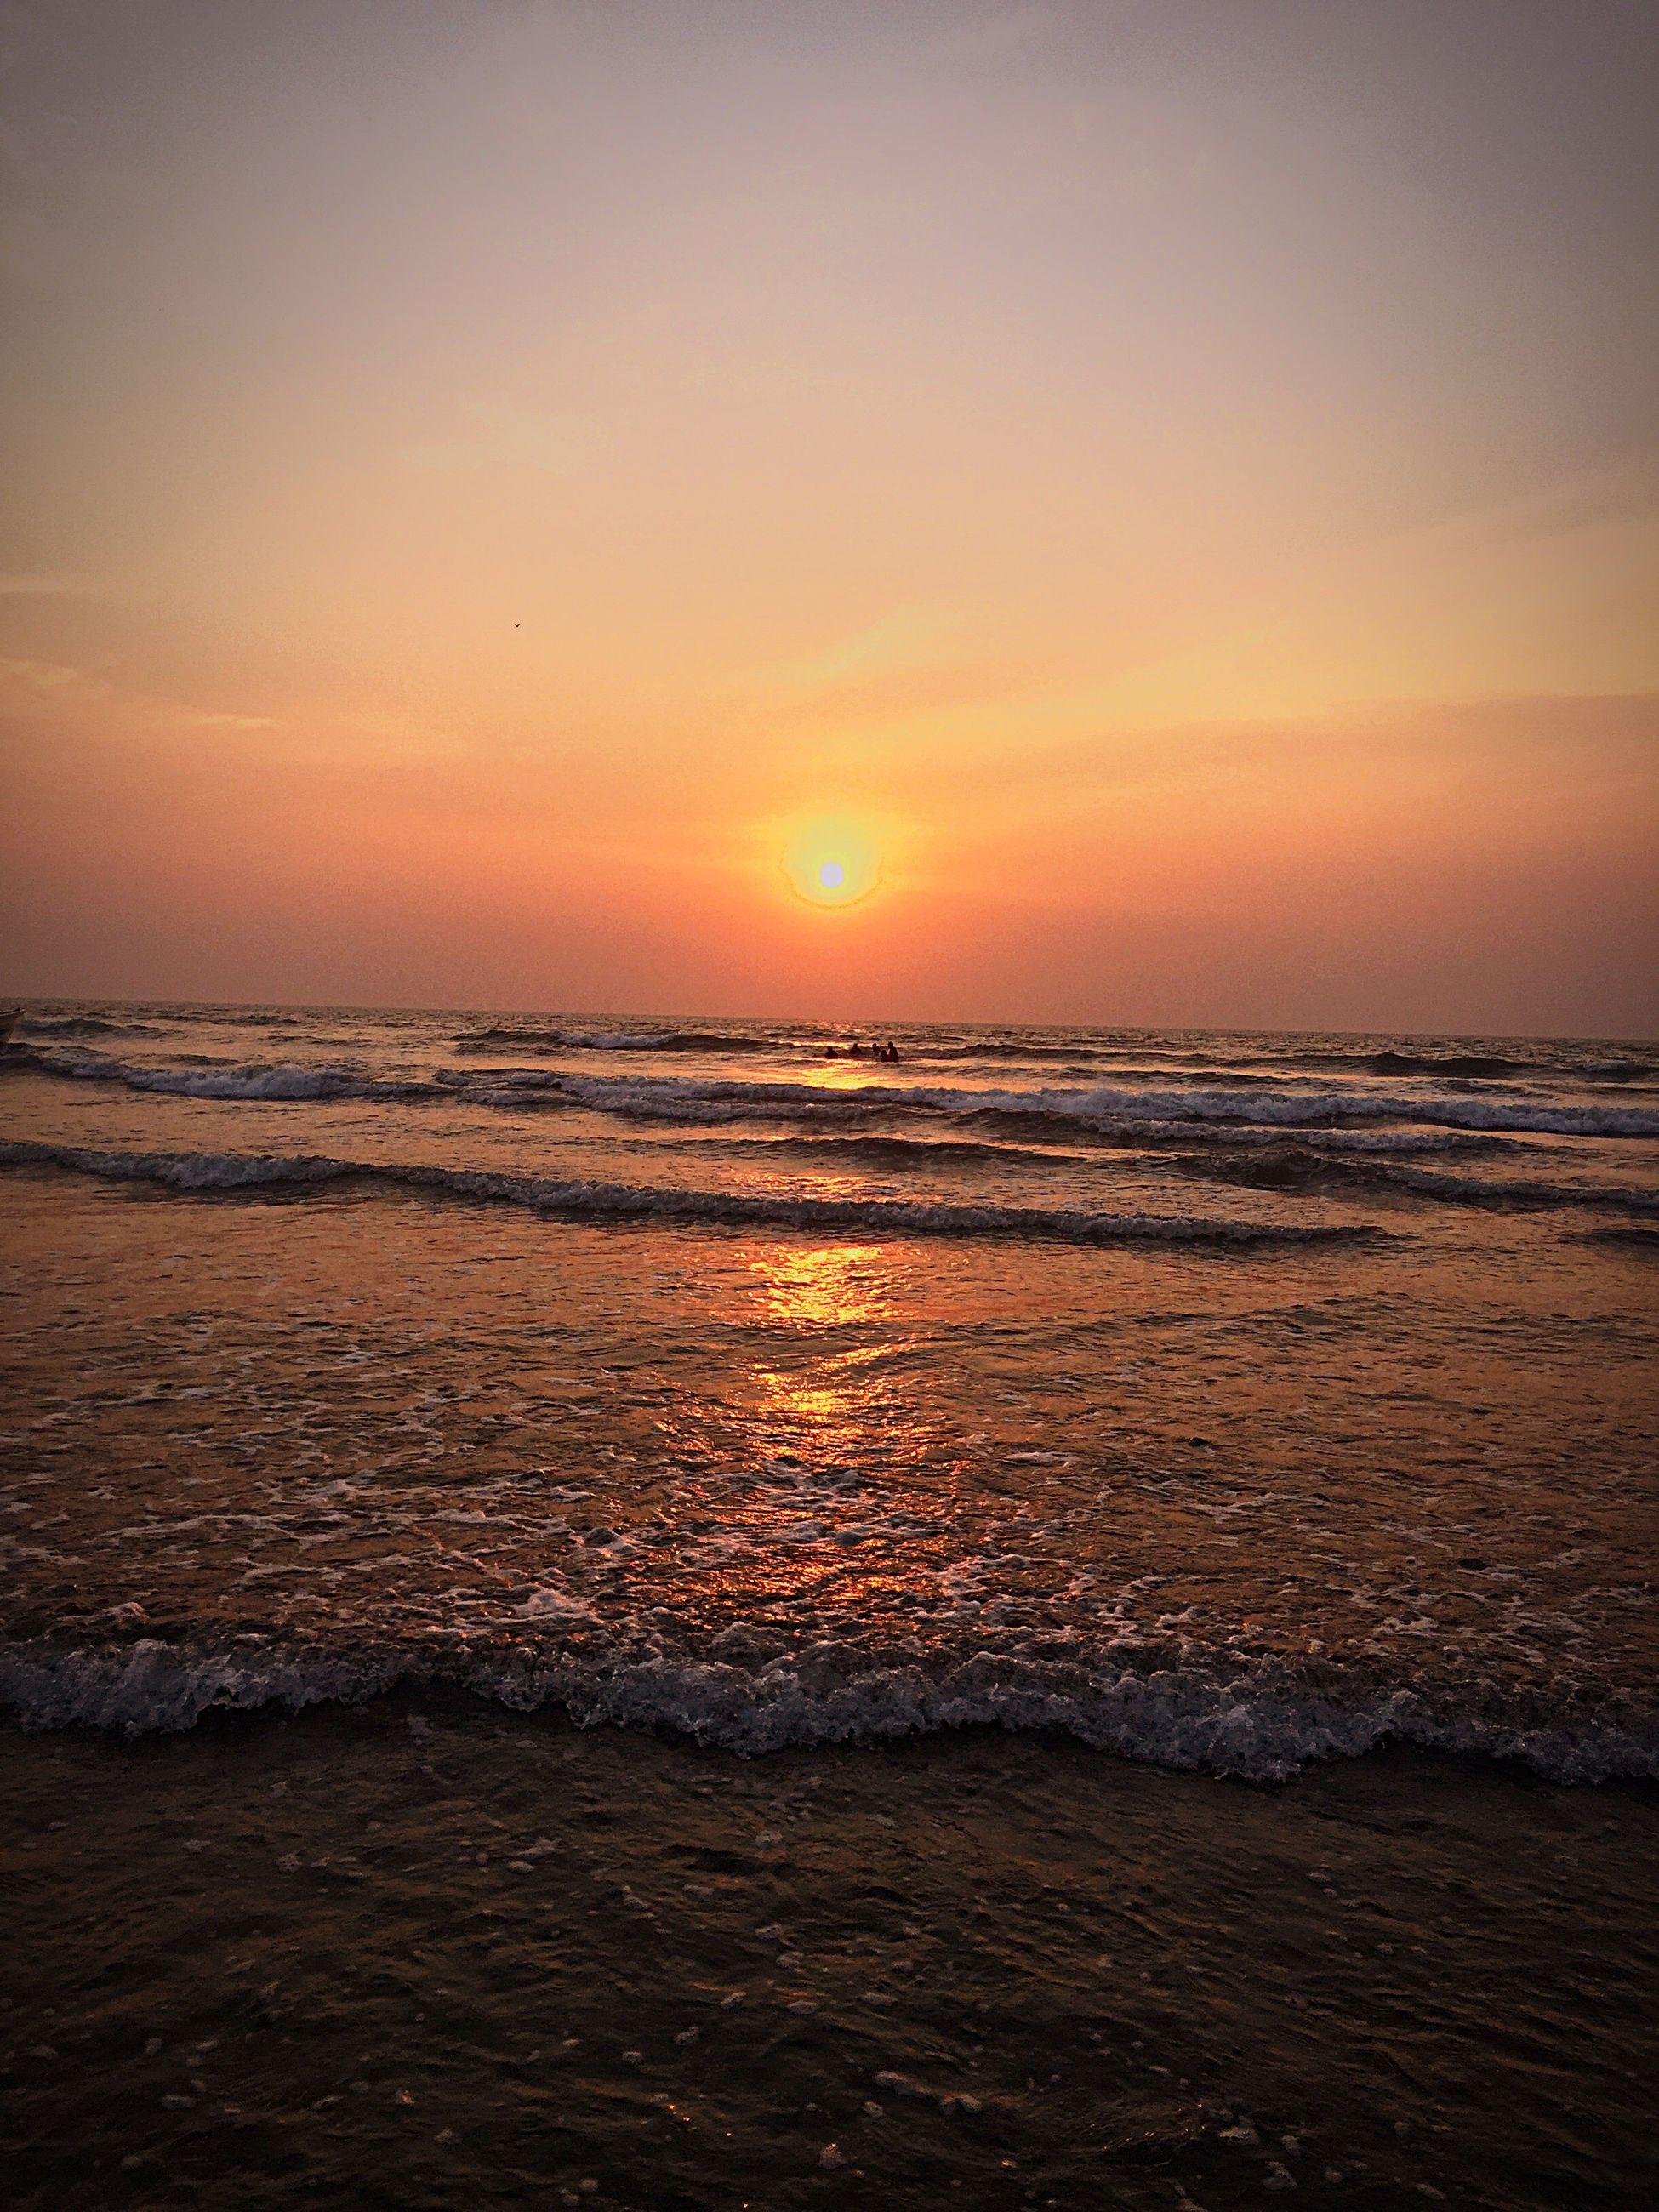 sea, sunset, horizon over water, water, scenics, tranquil scene, beach, beauty in nature, orange color, tranquility, shore, sky, idyllic, nature, wave, sun, seascape, rippled, coastline, remote